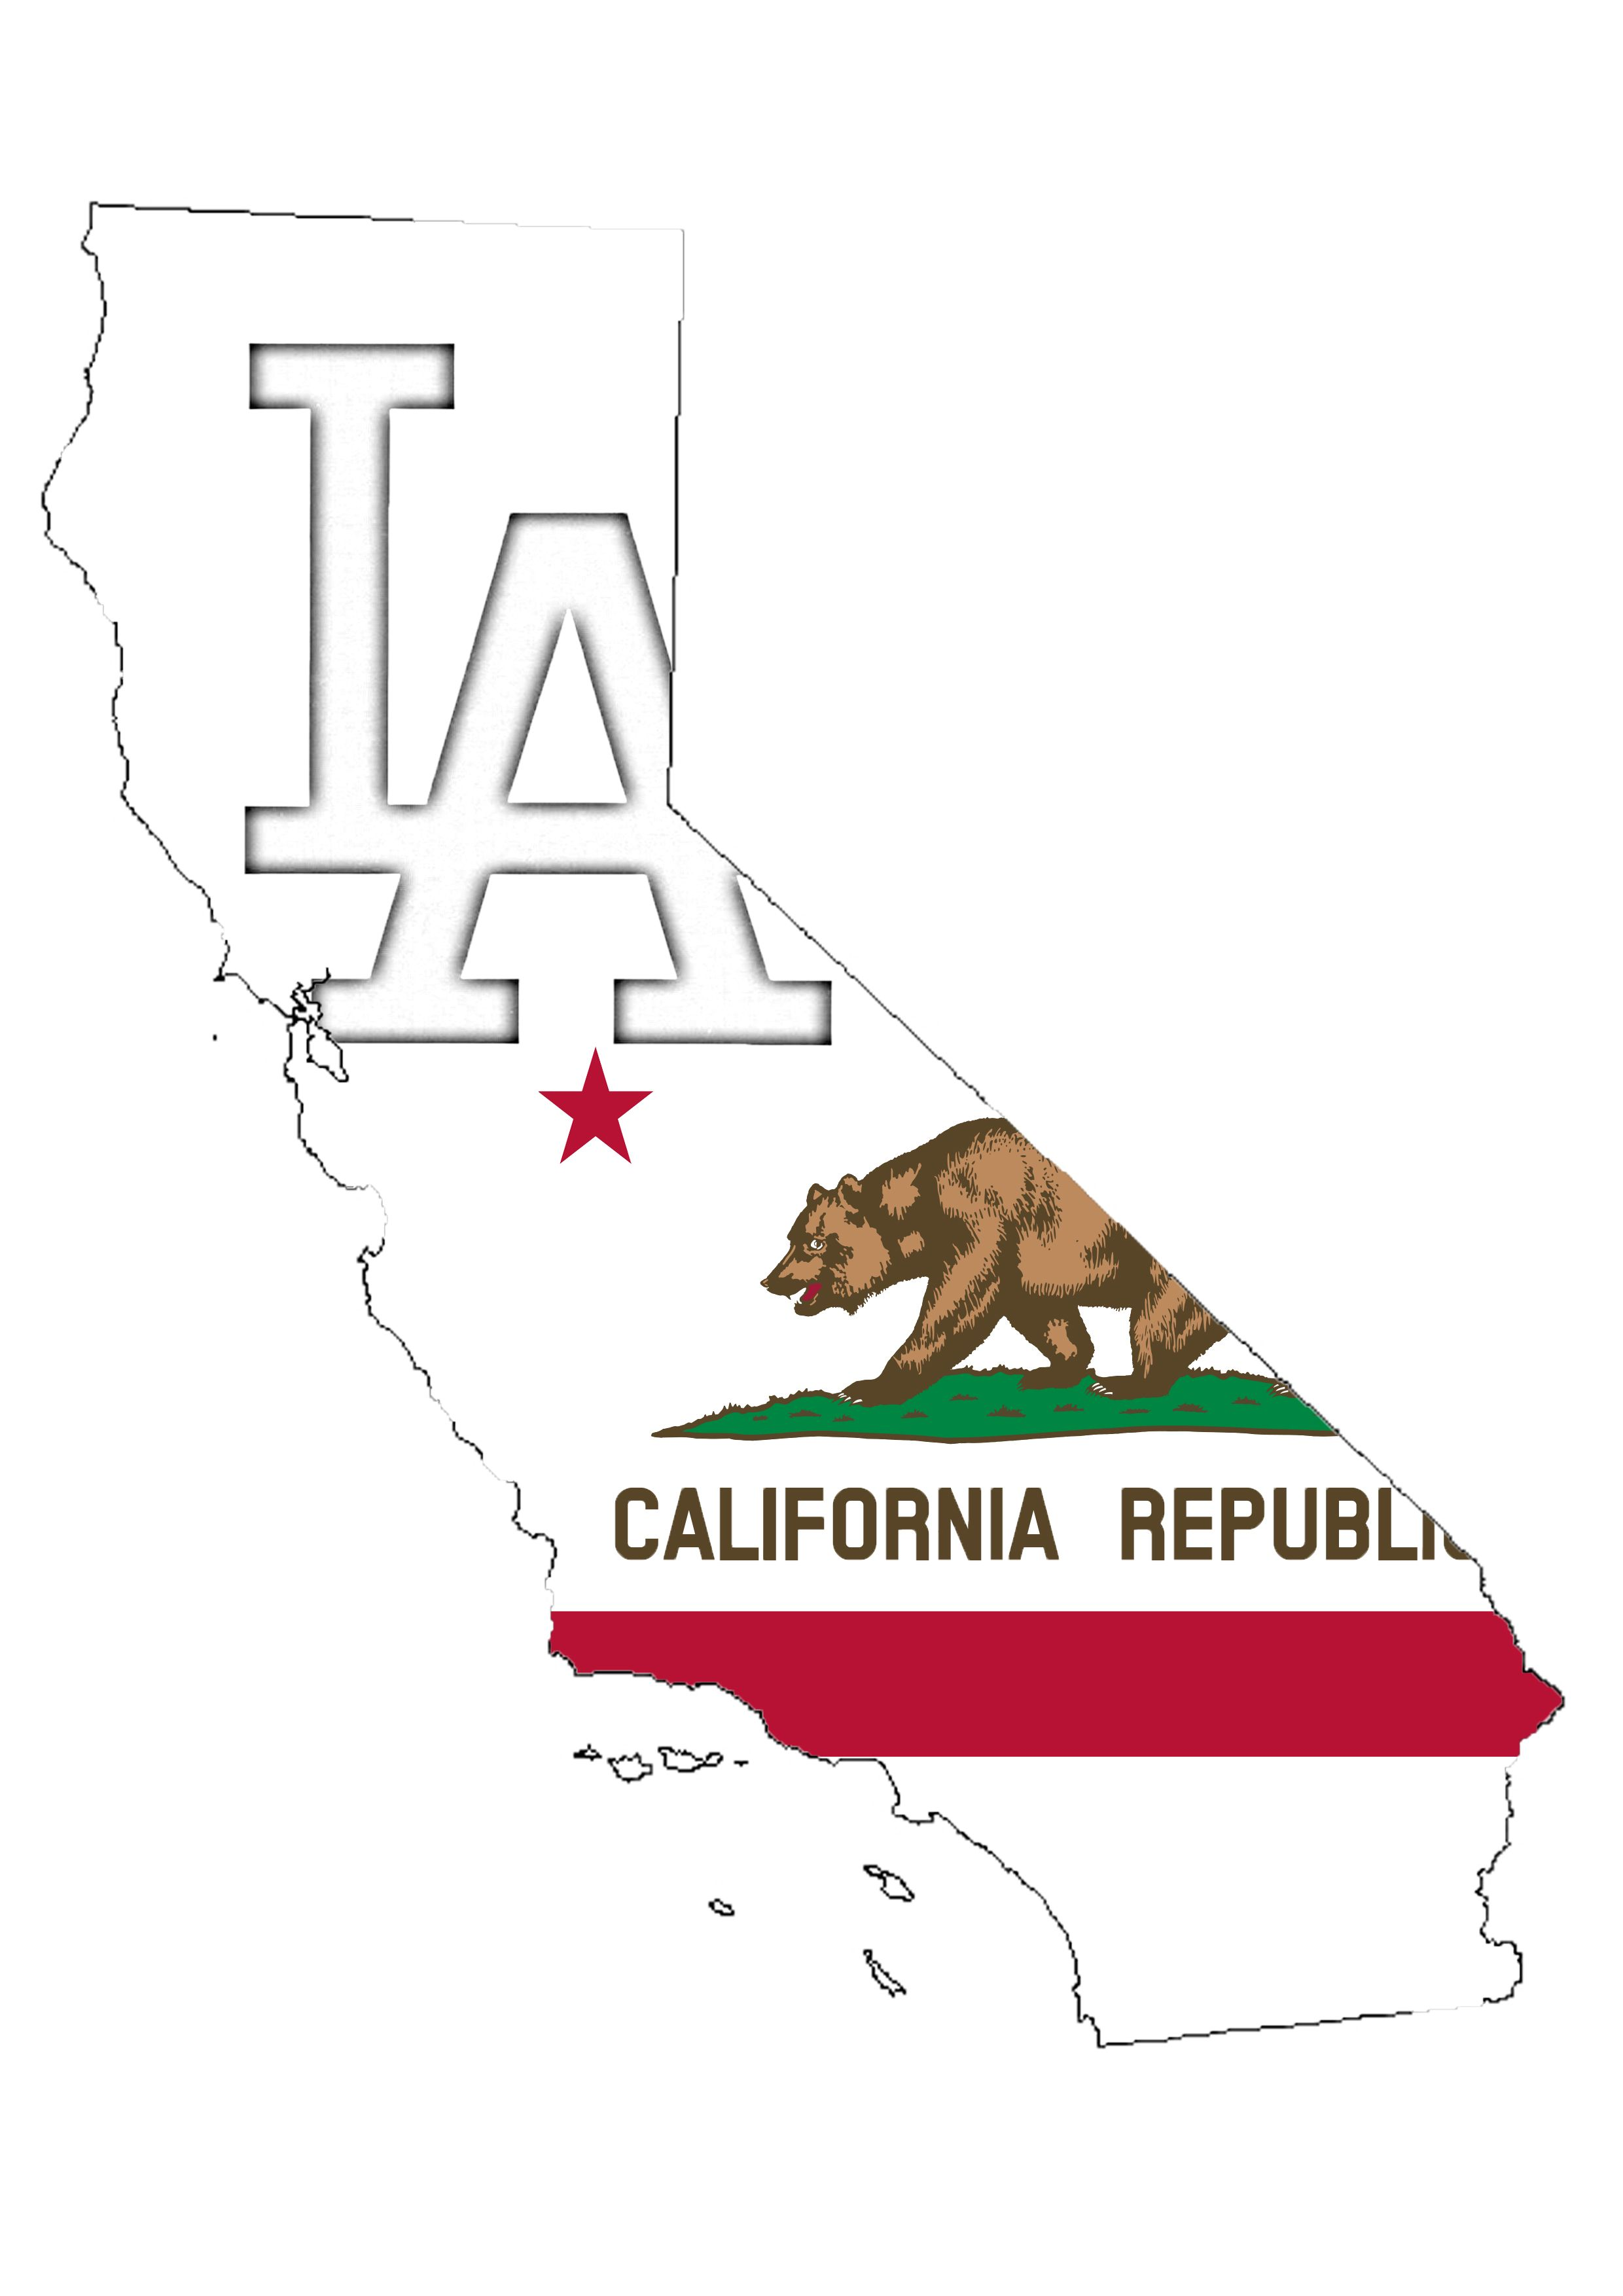 Los angeles california tattoo idea california bear